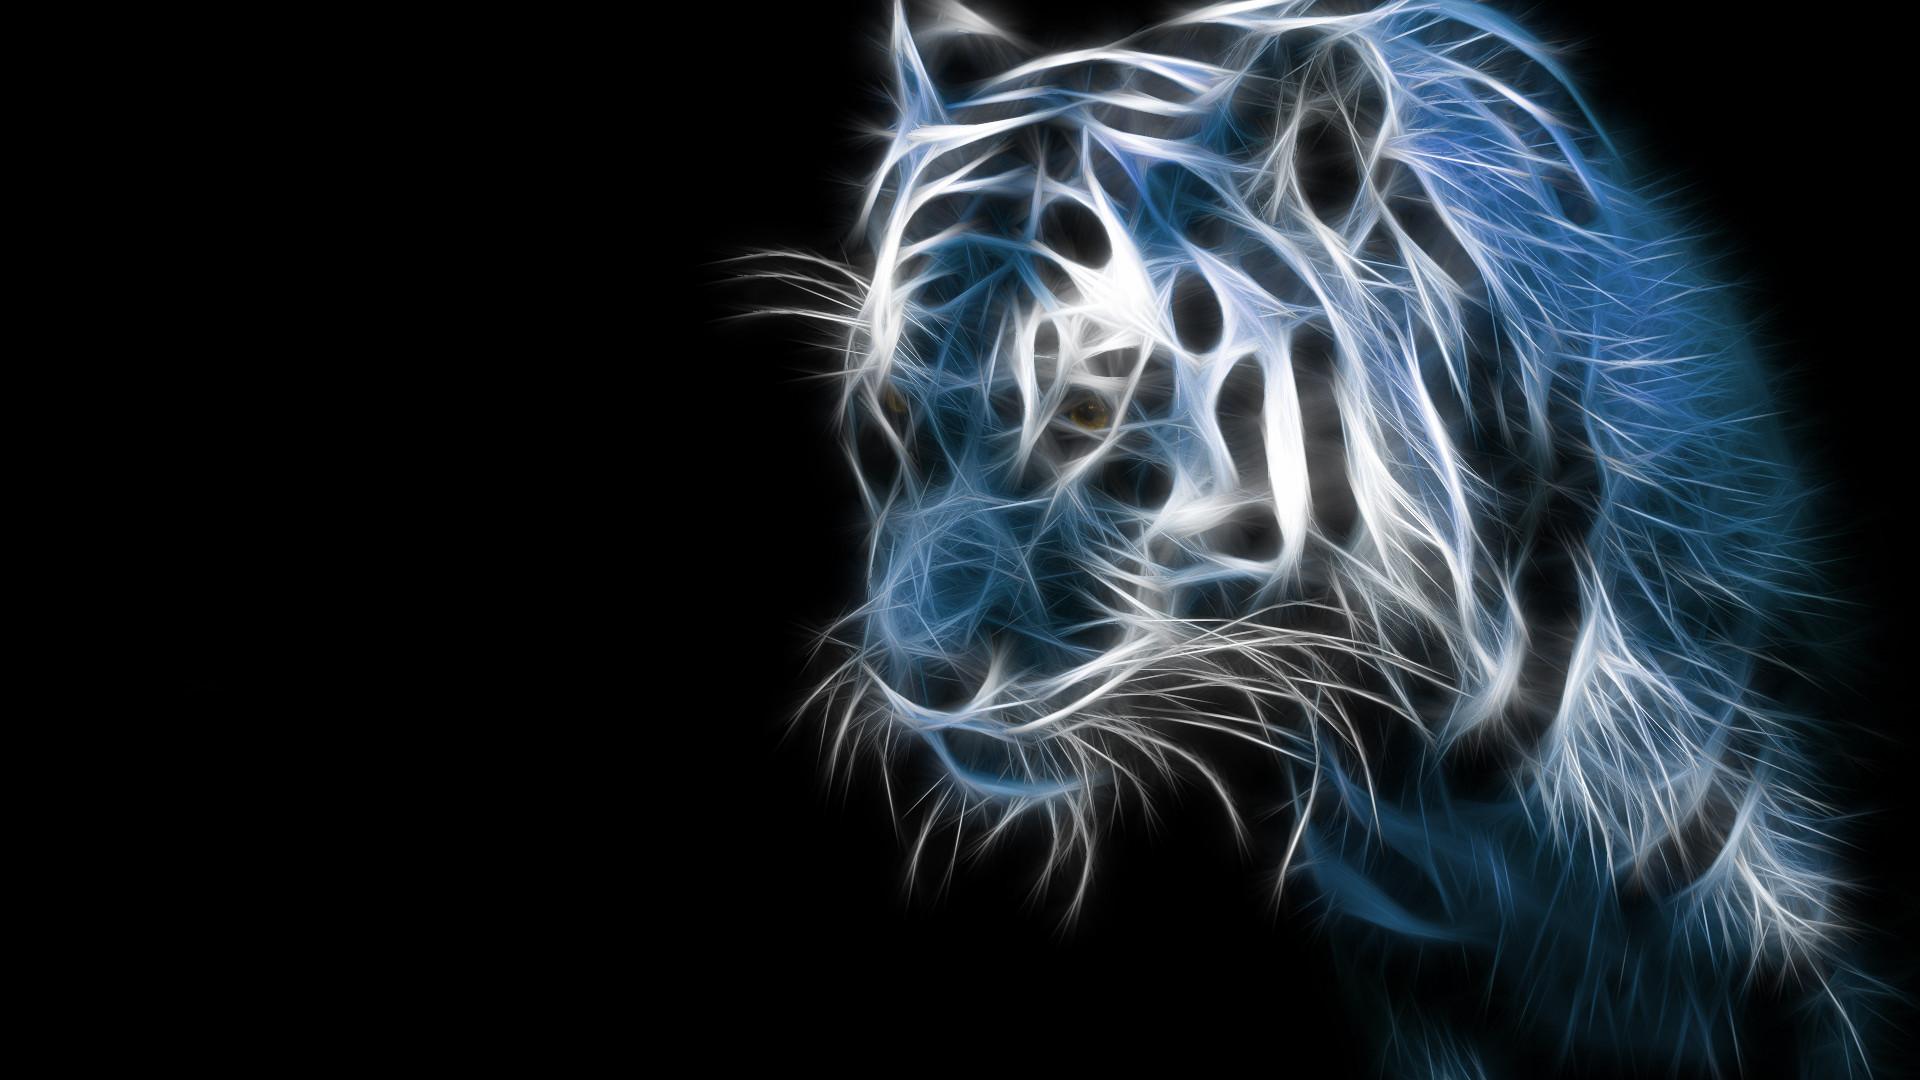 Download Tiger Animal Wallpaper Full HD Wallpapers